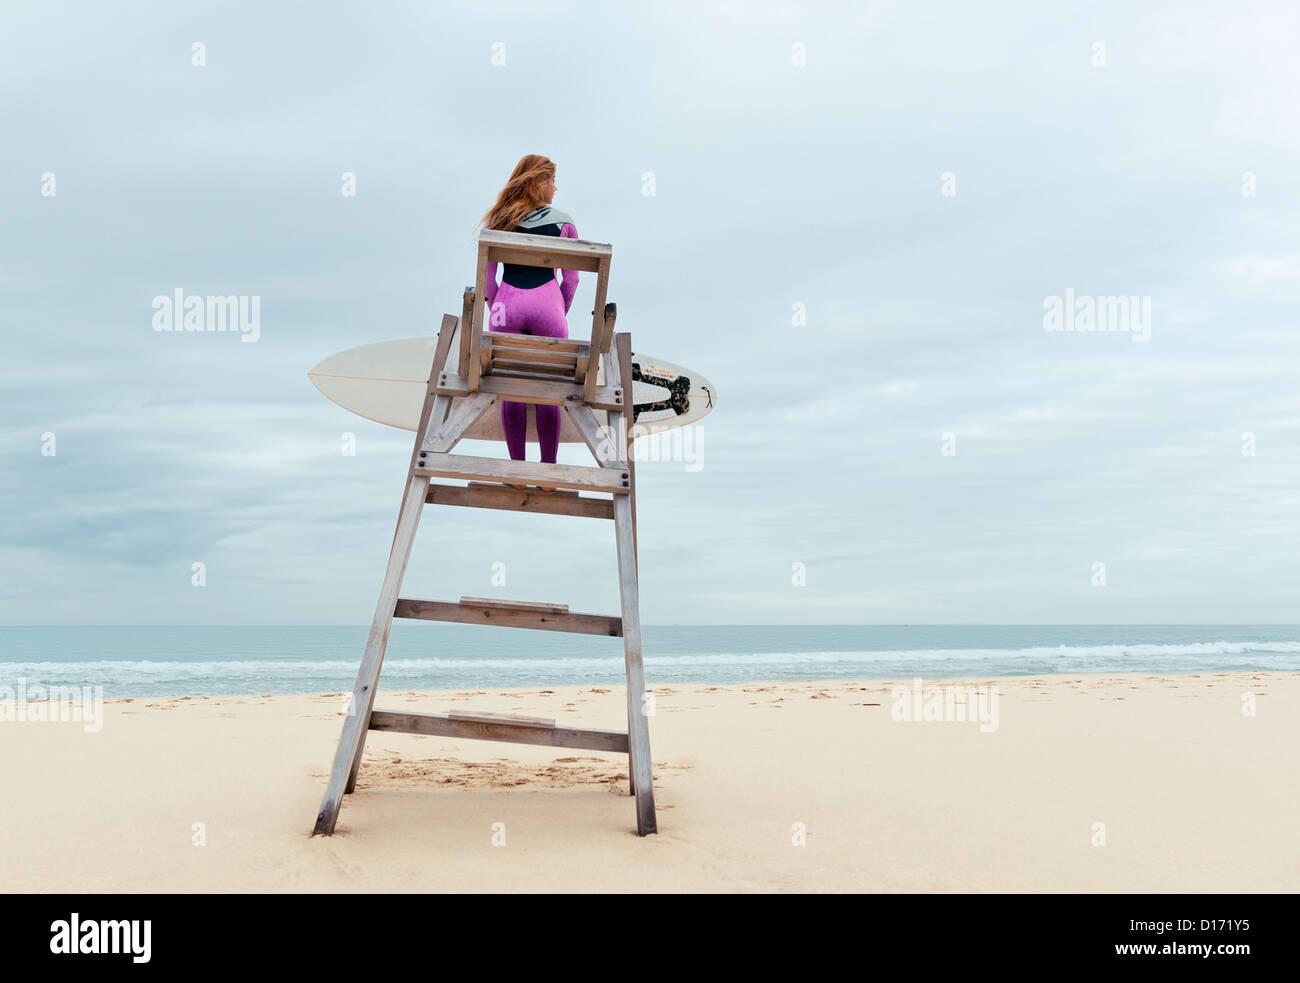 Surferin. Tarifa, Costa De La Luz, Cádiz, Andalusien, Spanien. Stockbild